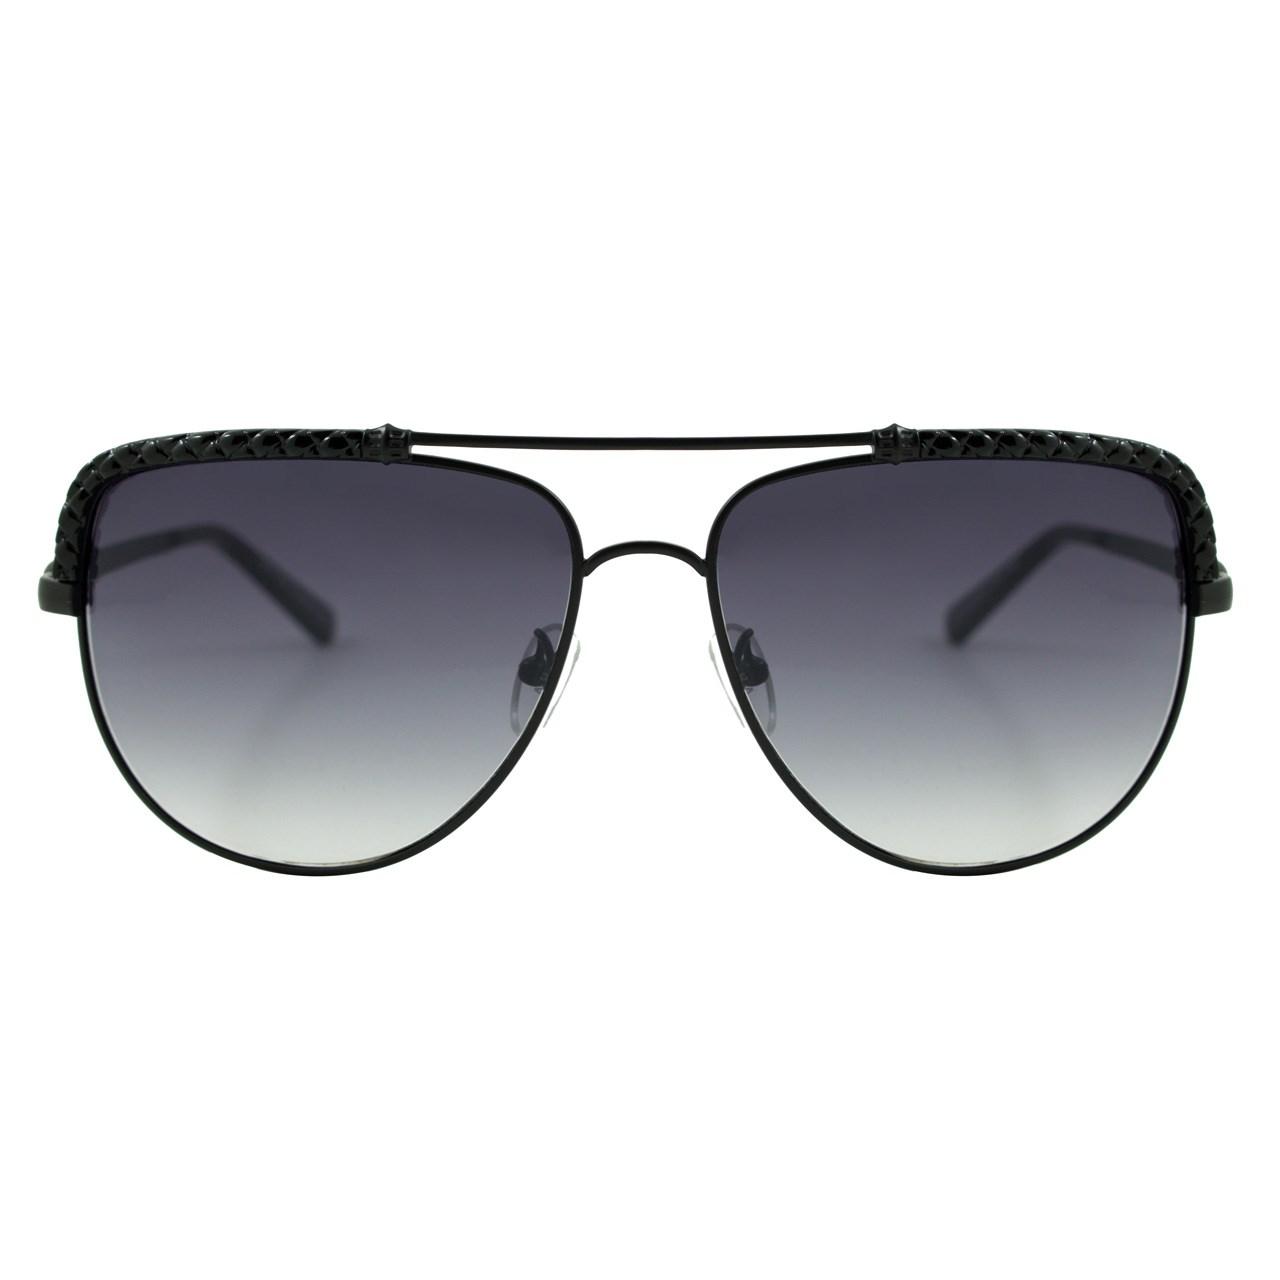 عینک آفتابی اونکس مدل LangTemeng Black Chain